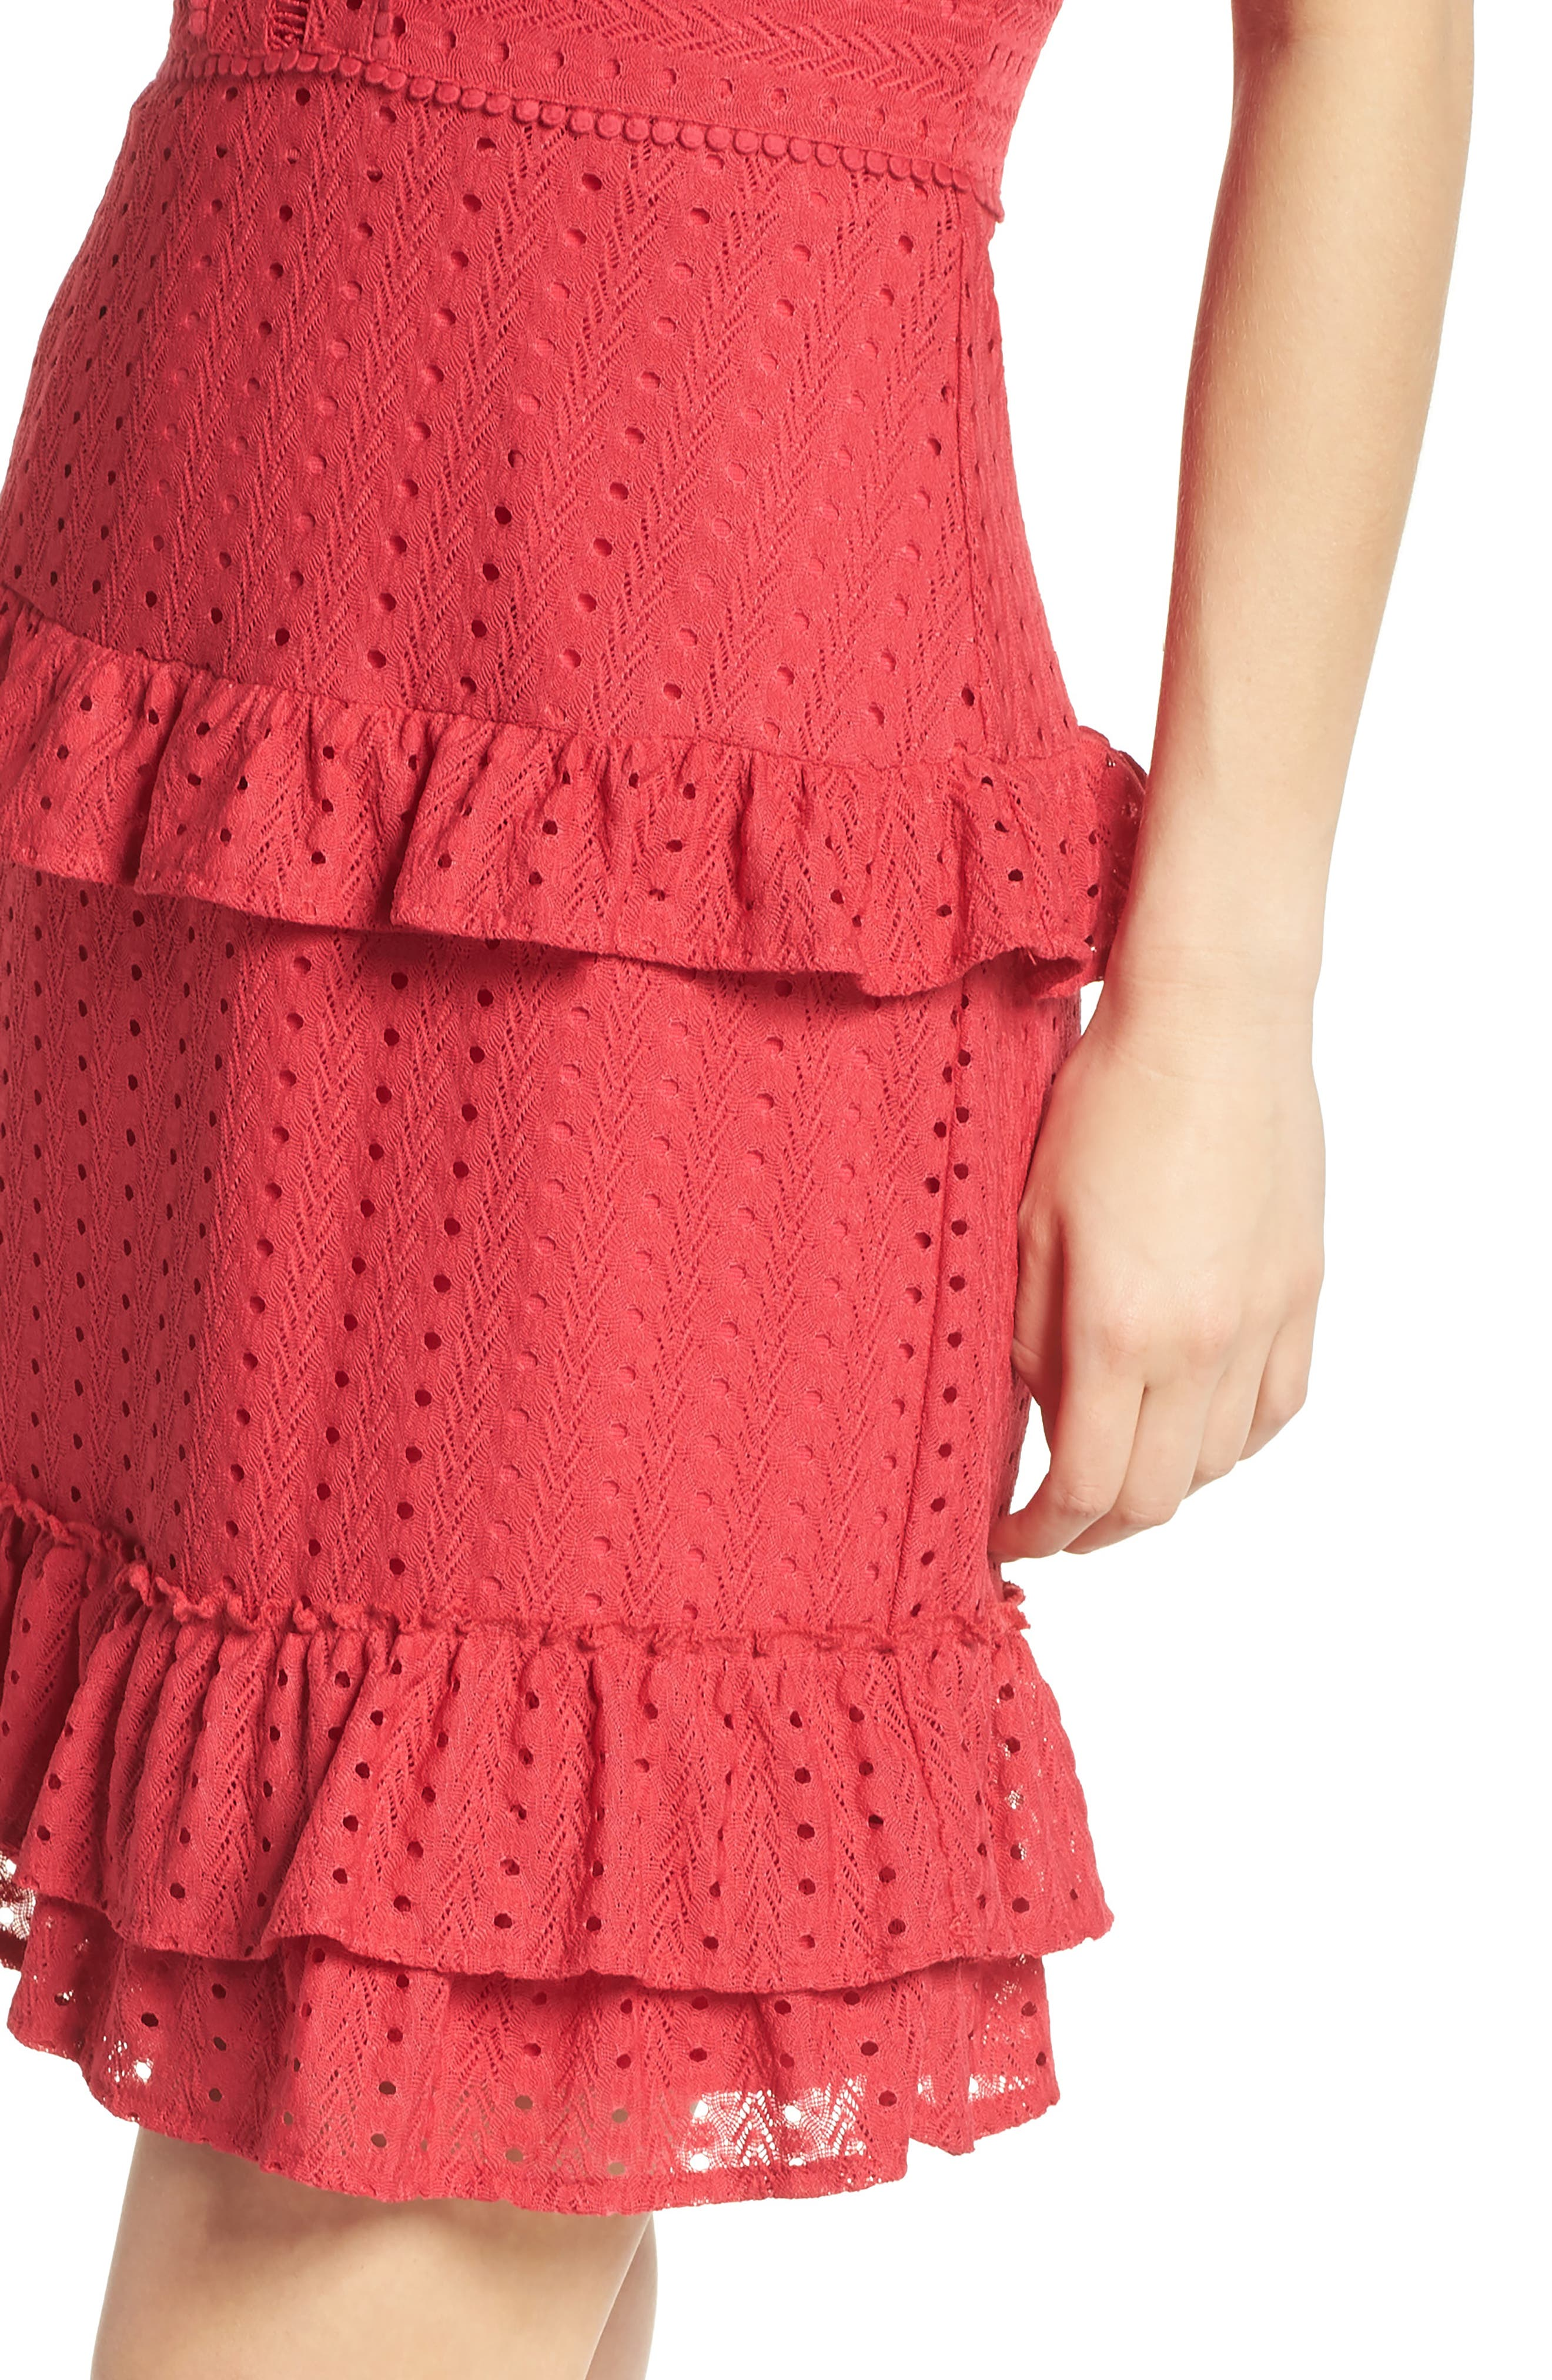 Sleeveless Ruffle Knit Sheath Dress,                             Alternate thumbnail 4, color,                             600